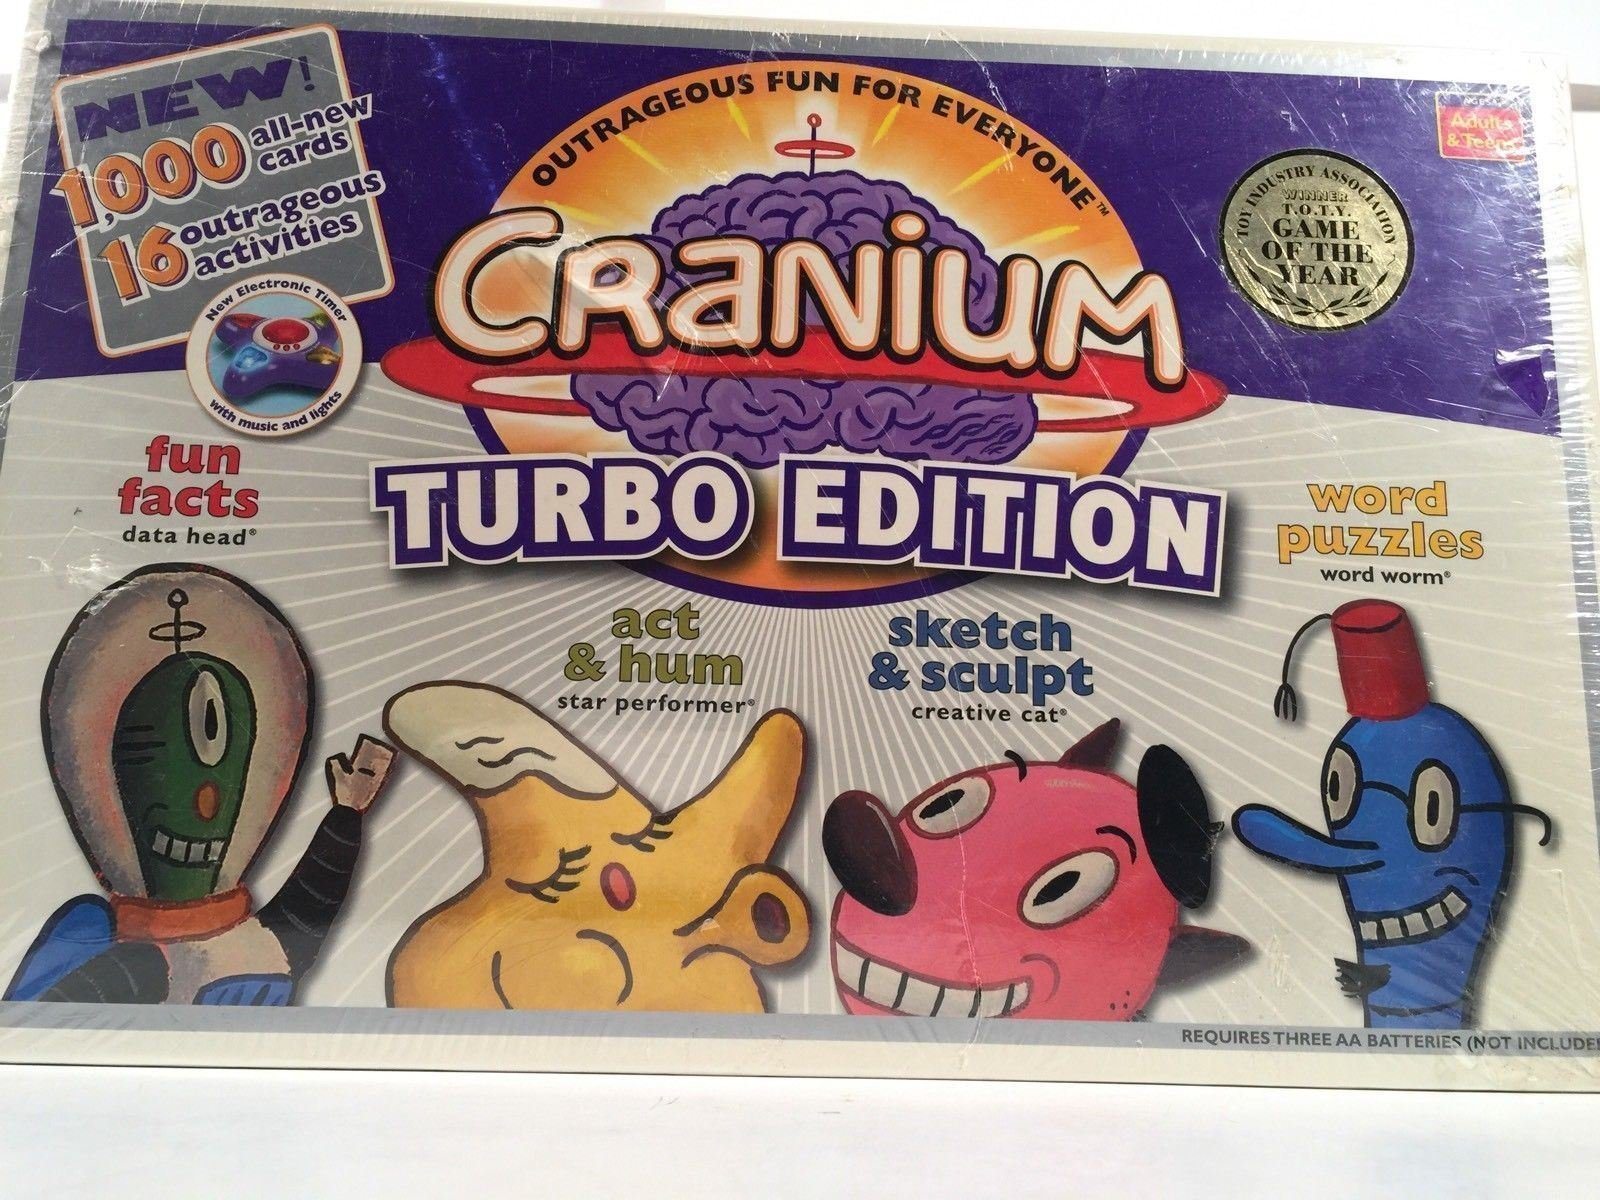 Baseman Cranium Turbo Edition 1000 NEW Cards 6 New Activities New In Box by Baseman (Image #2)